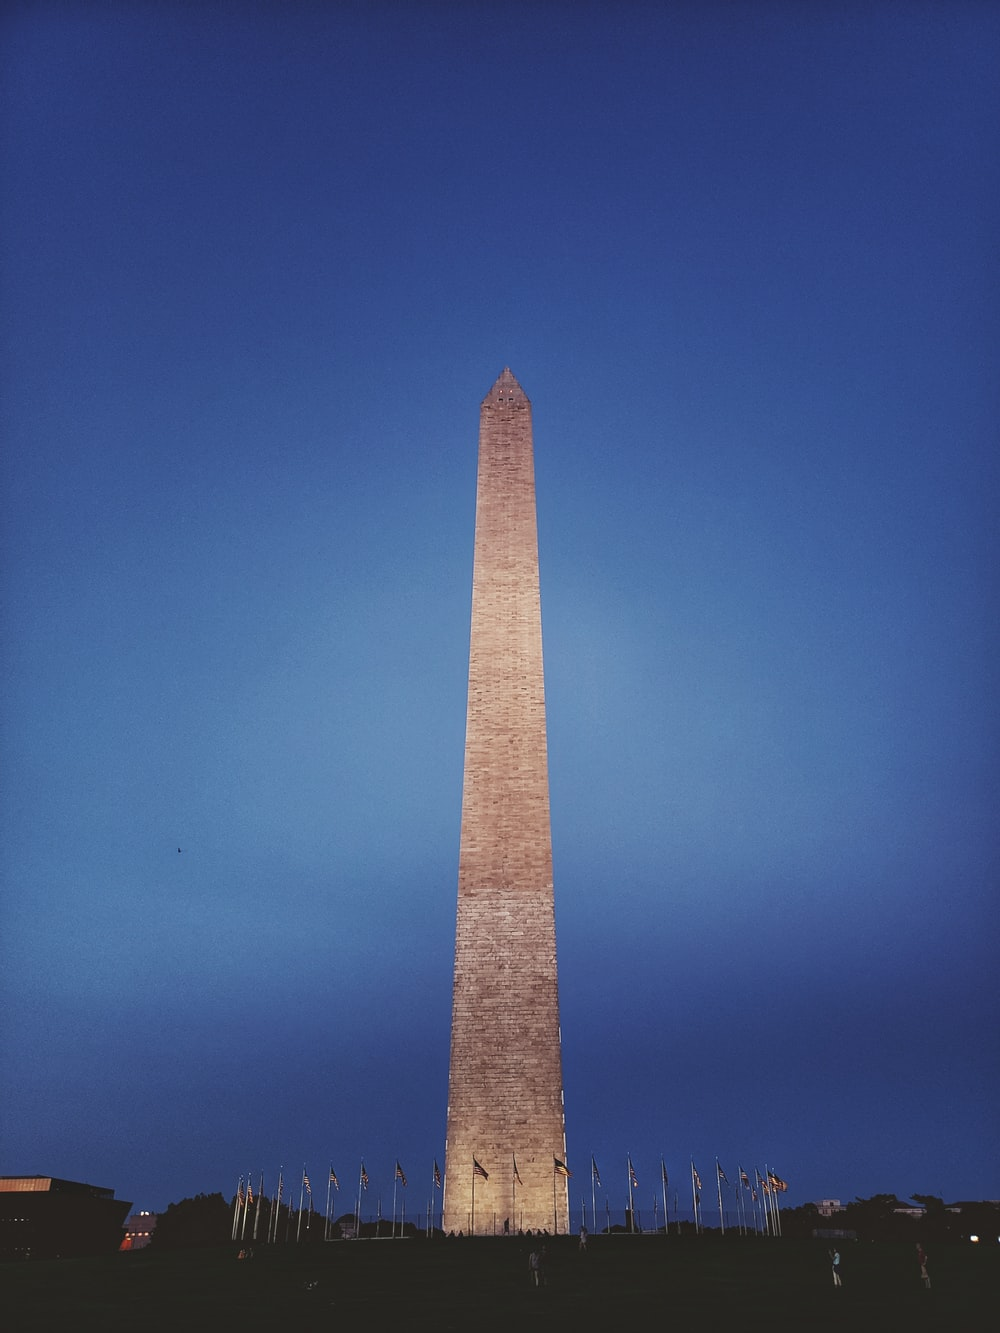 brown concrete tower under blue sky